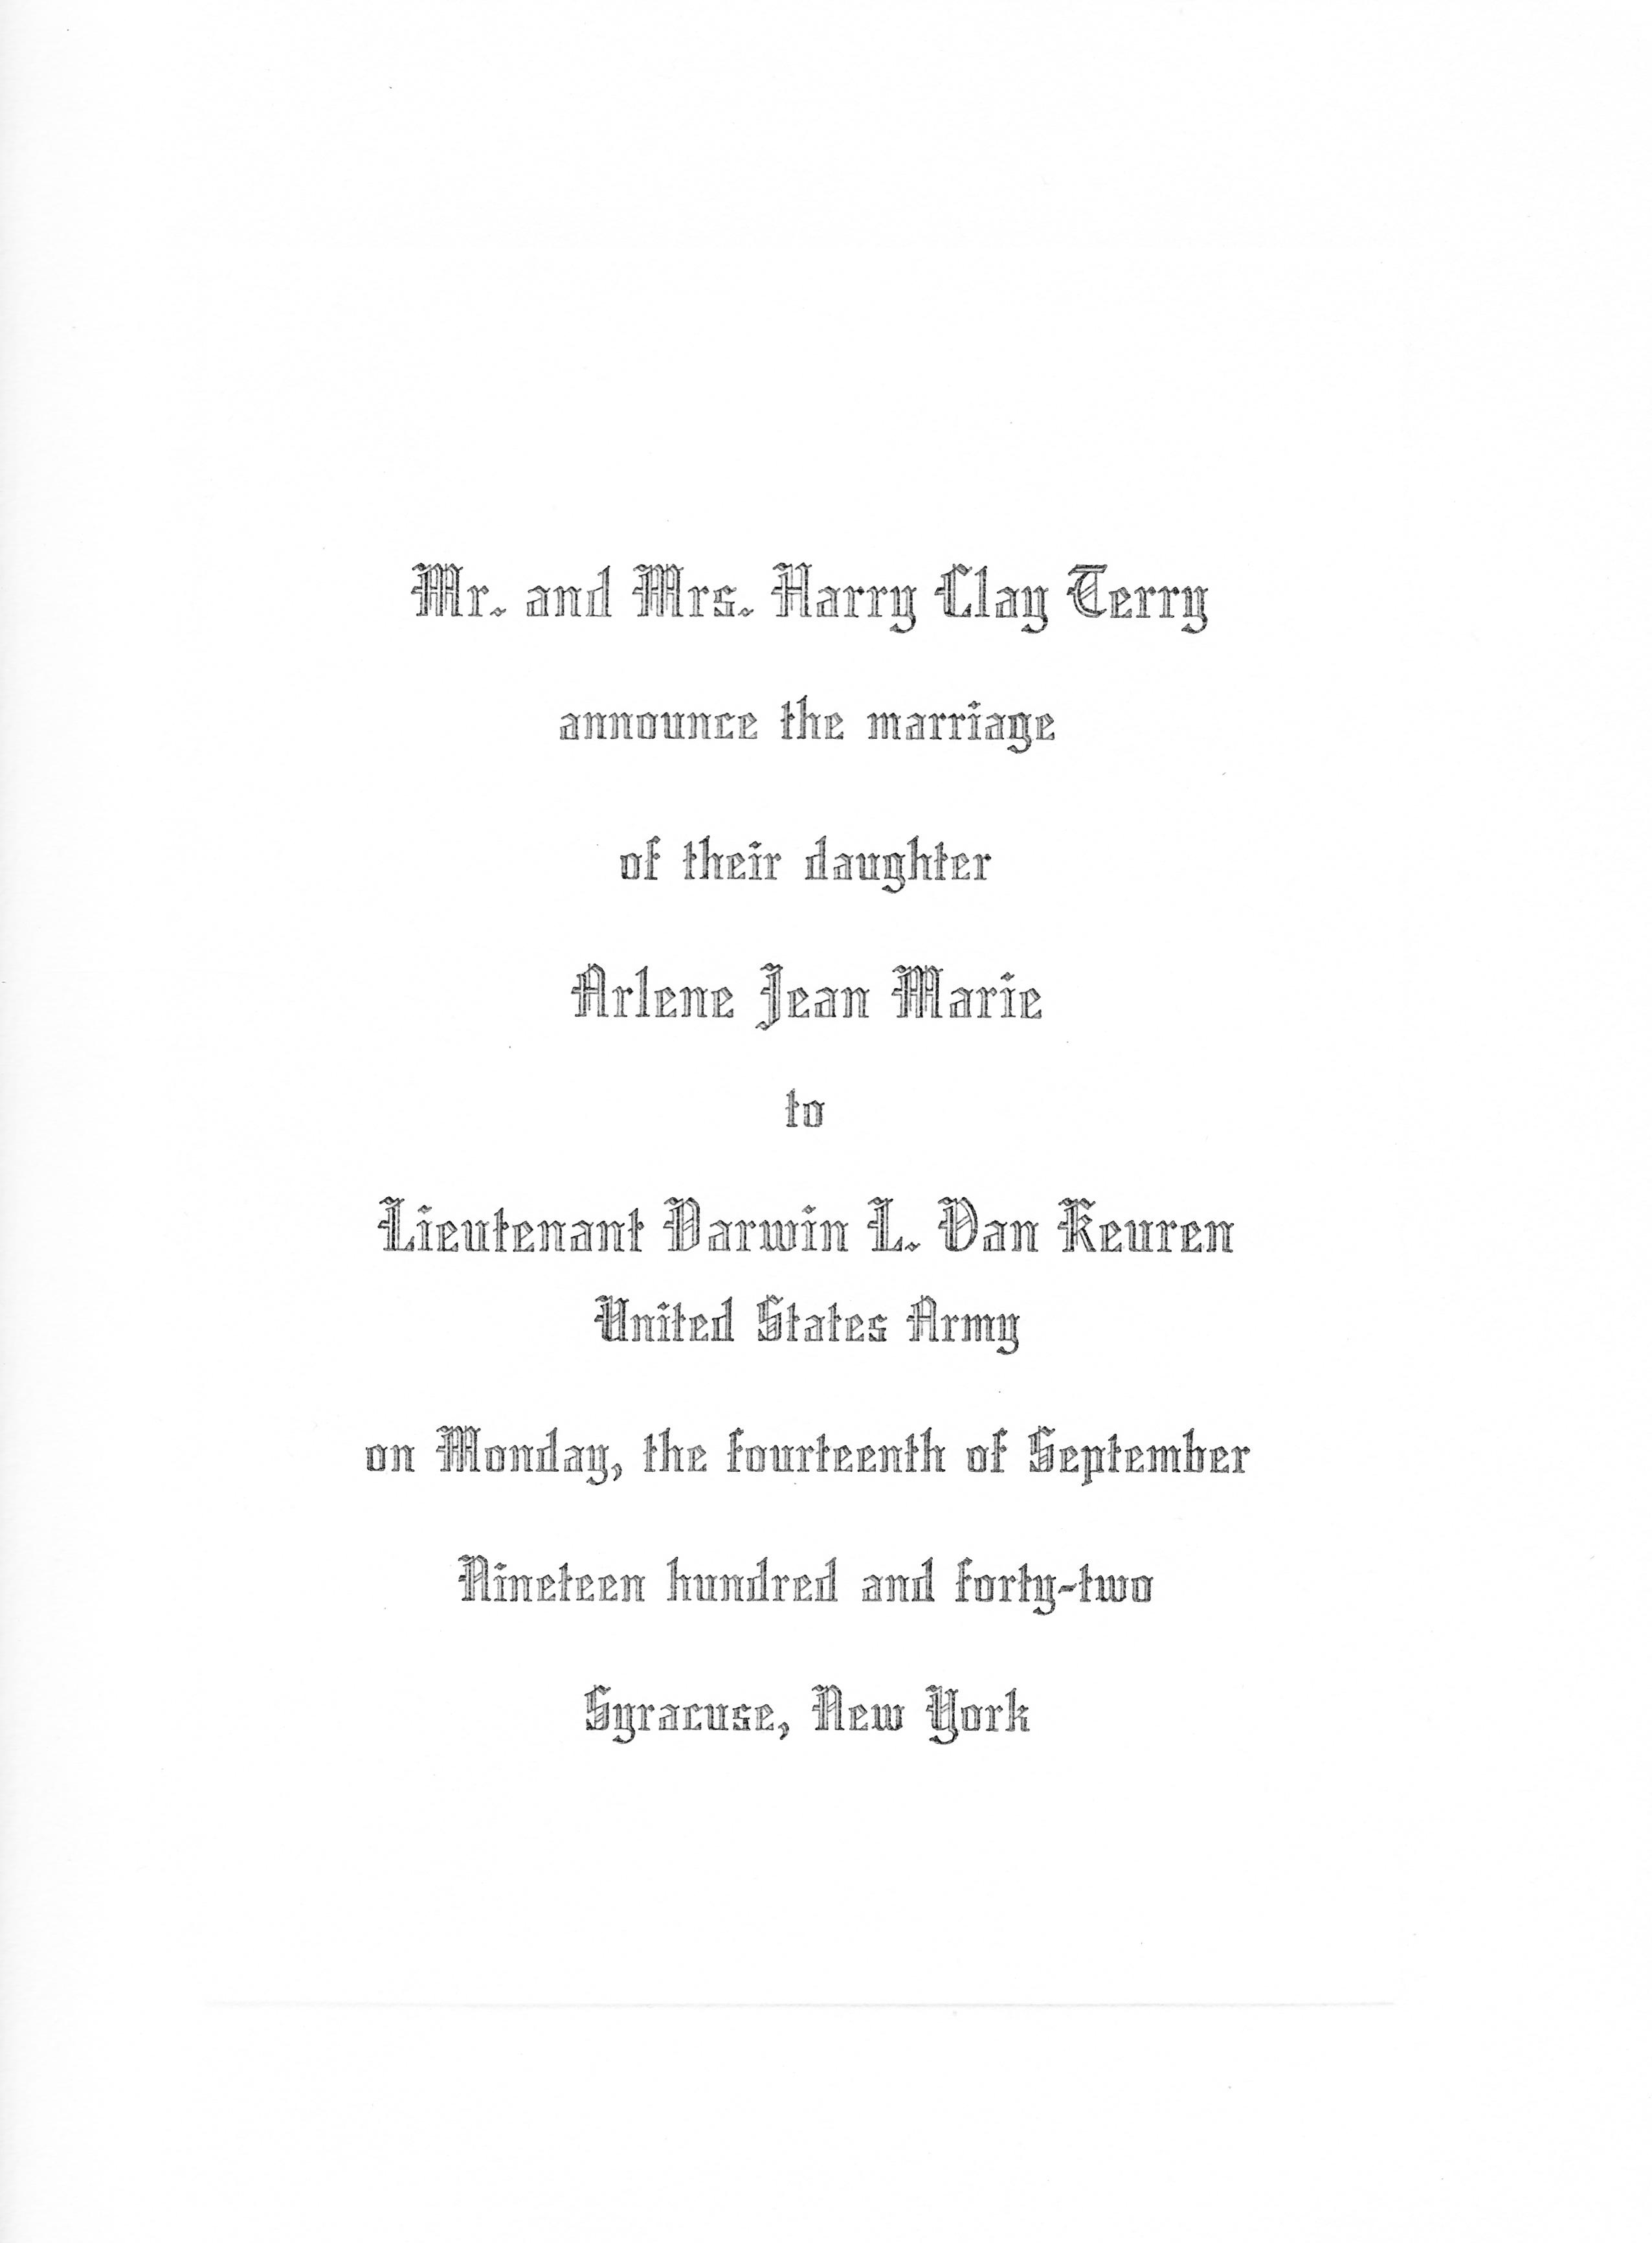 wedding invitation from 1942